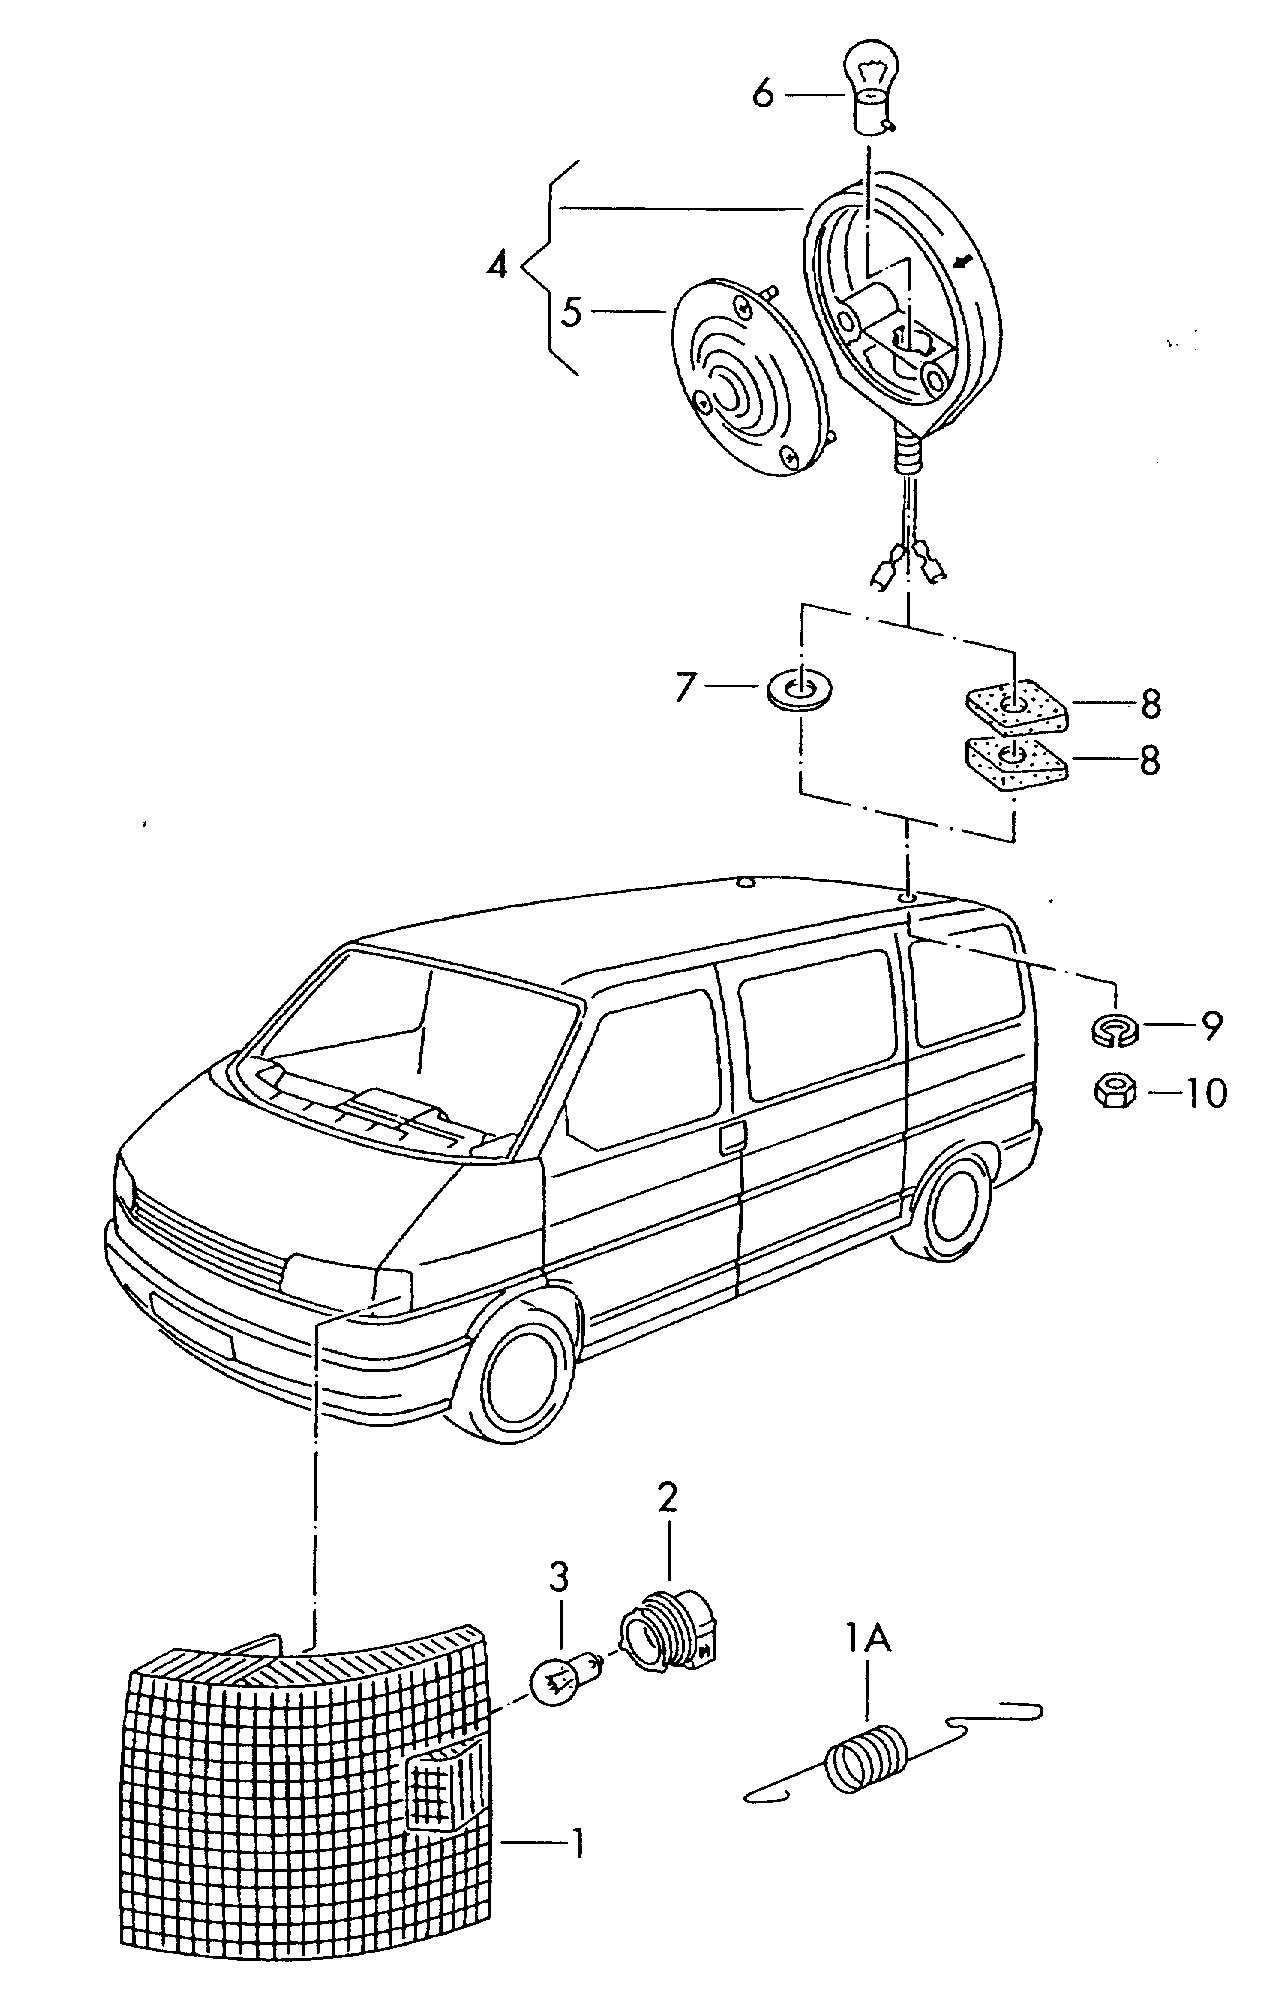 1993 Volkswagen EuroVan Turn signal front